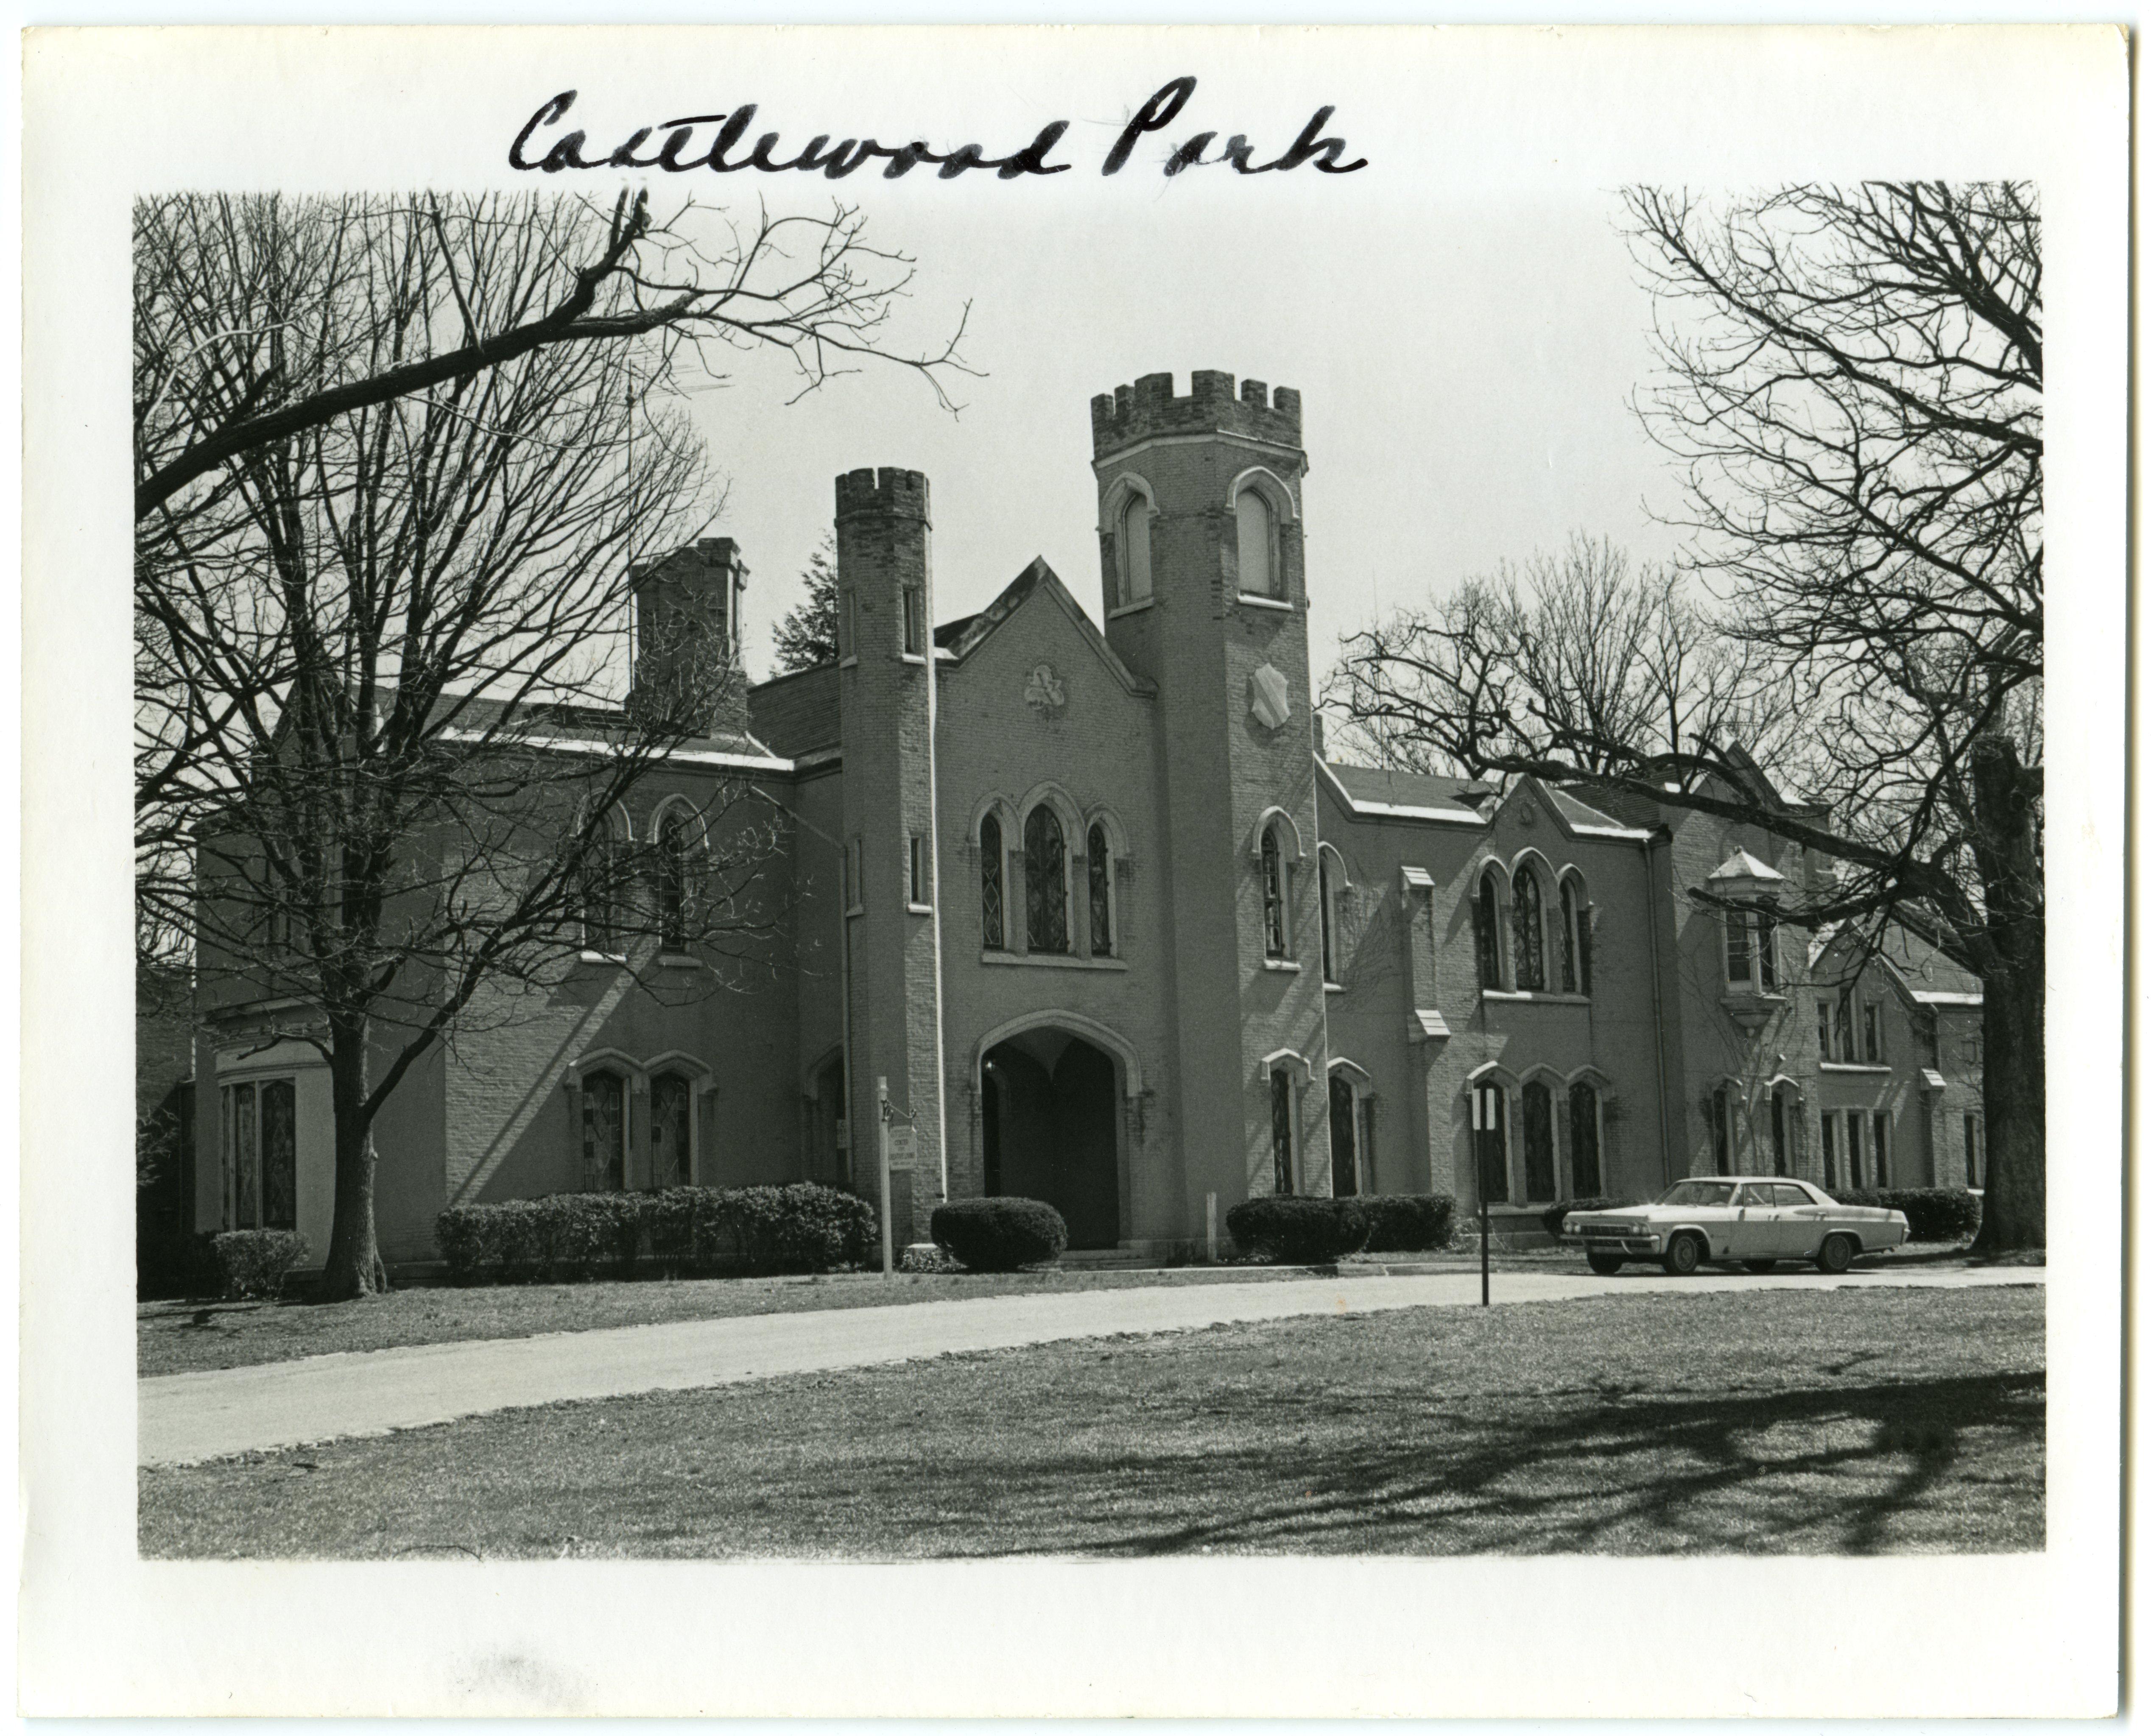 Loudoun House Castlewood Park Built In 1850 From Plans